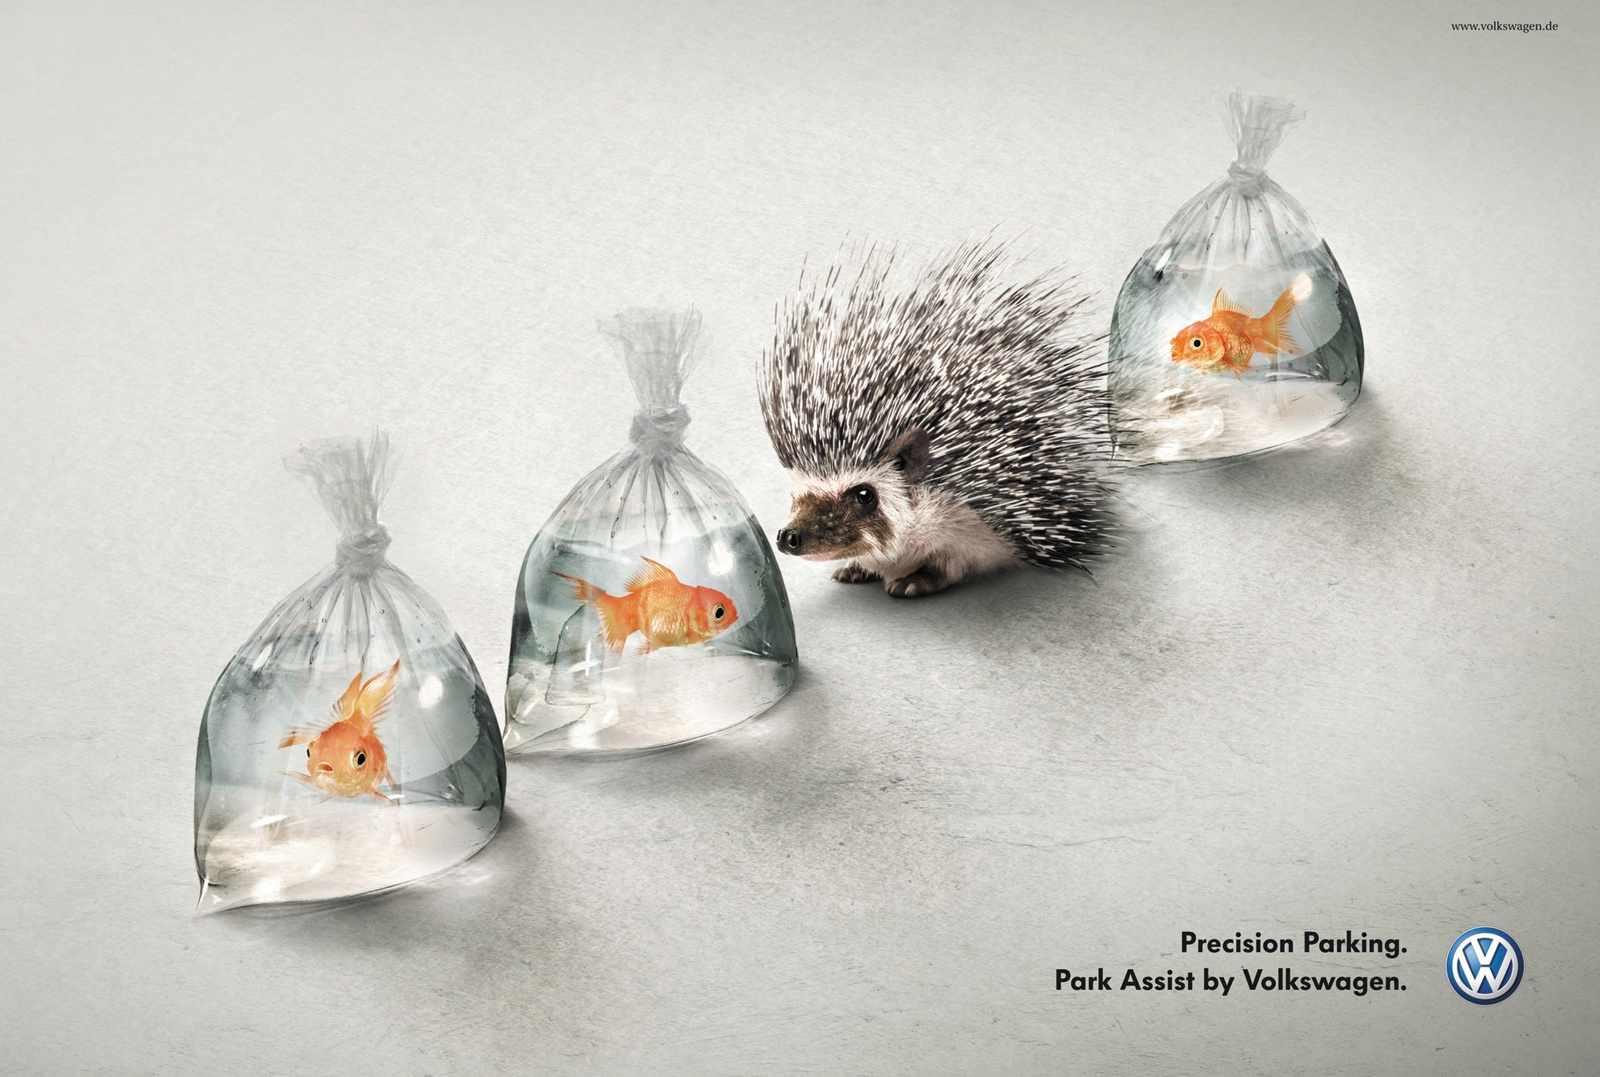 hedgehog and fish volkswagen park assist